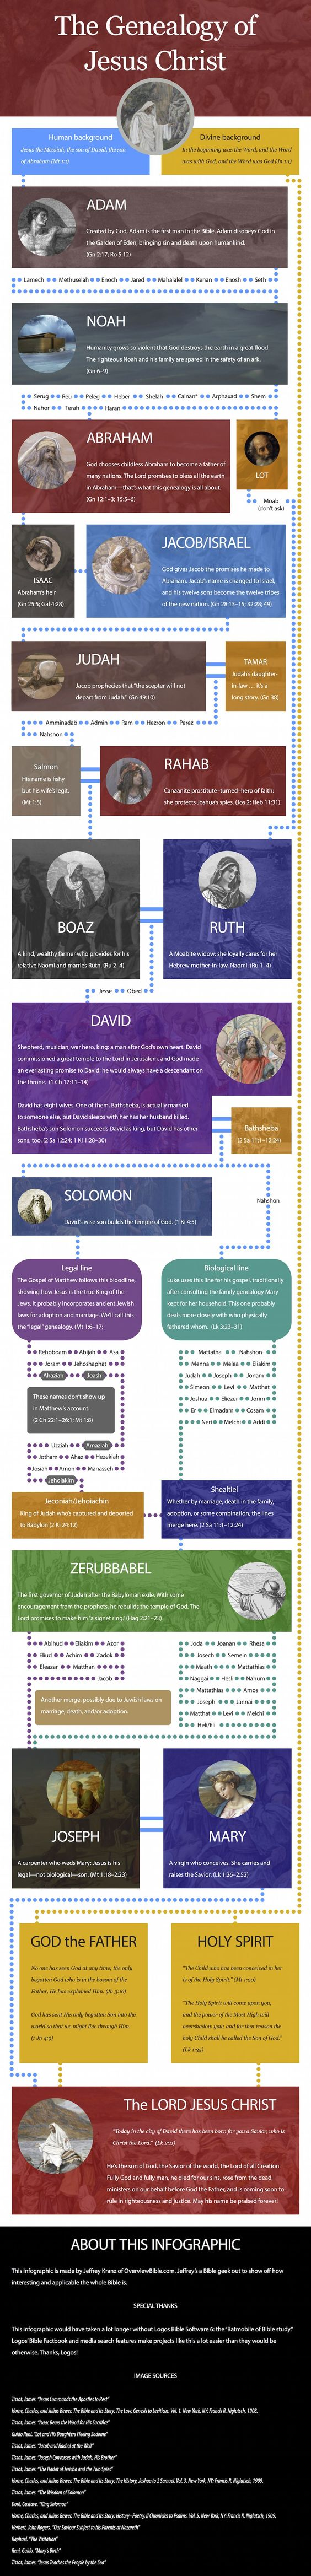 Genealogy of Jesus Infographic Zach J. Hoag memlok.com #biblememory: